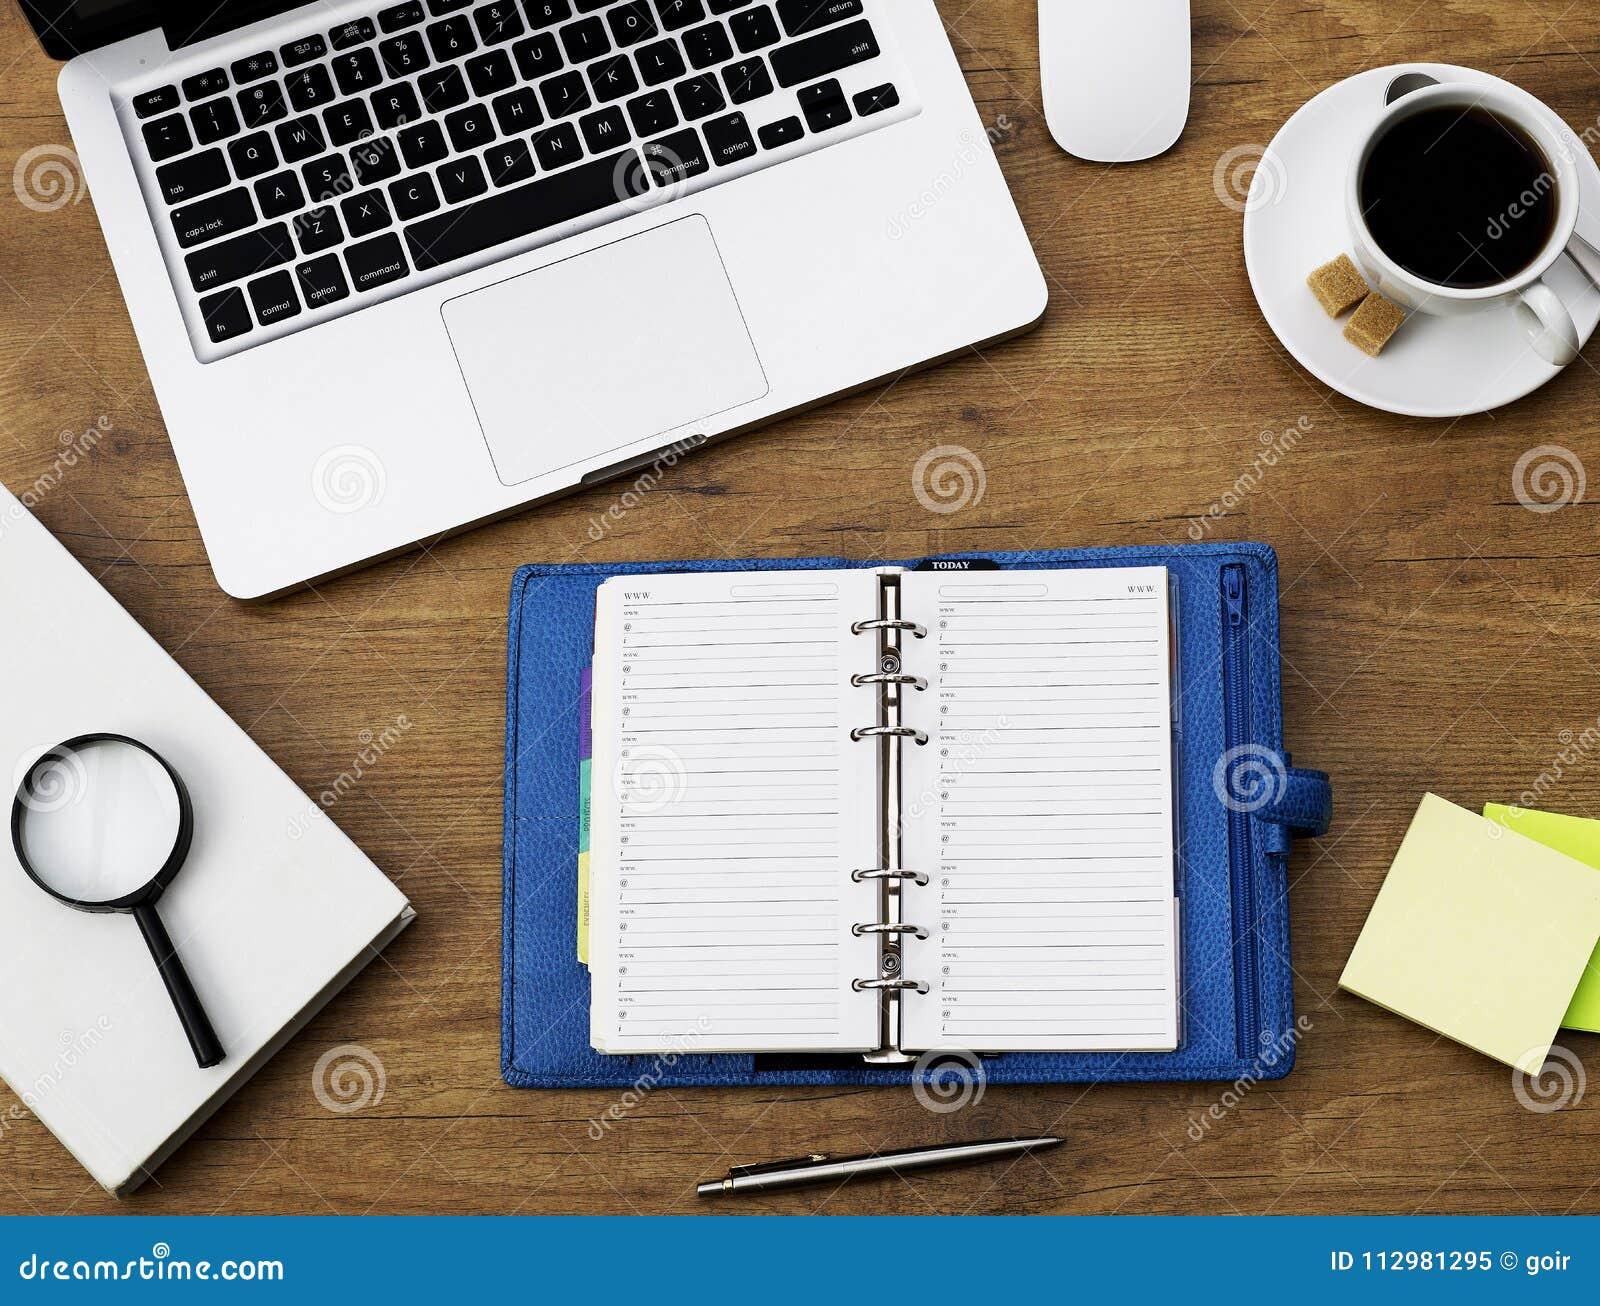 Personal organizer on desk